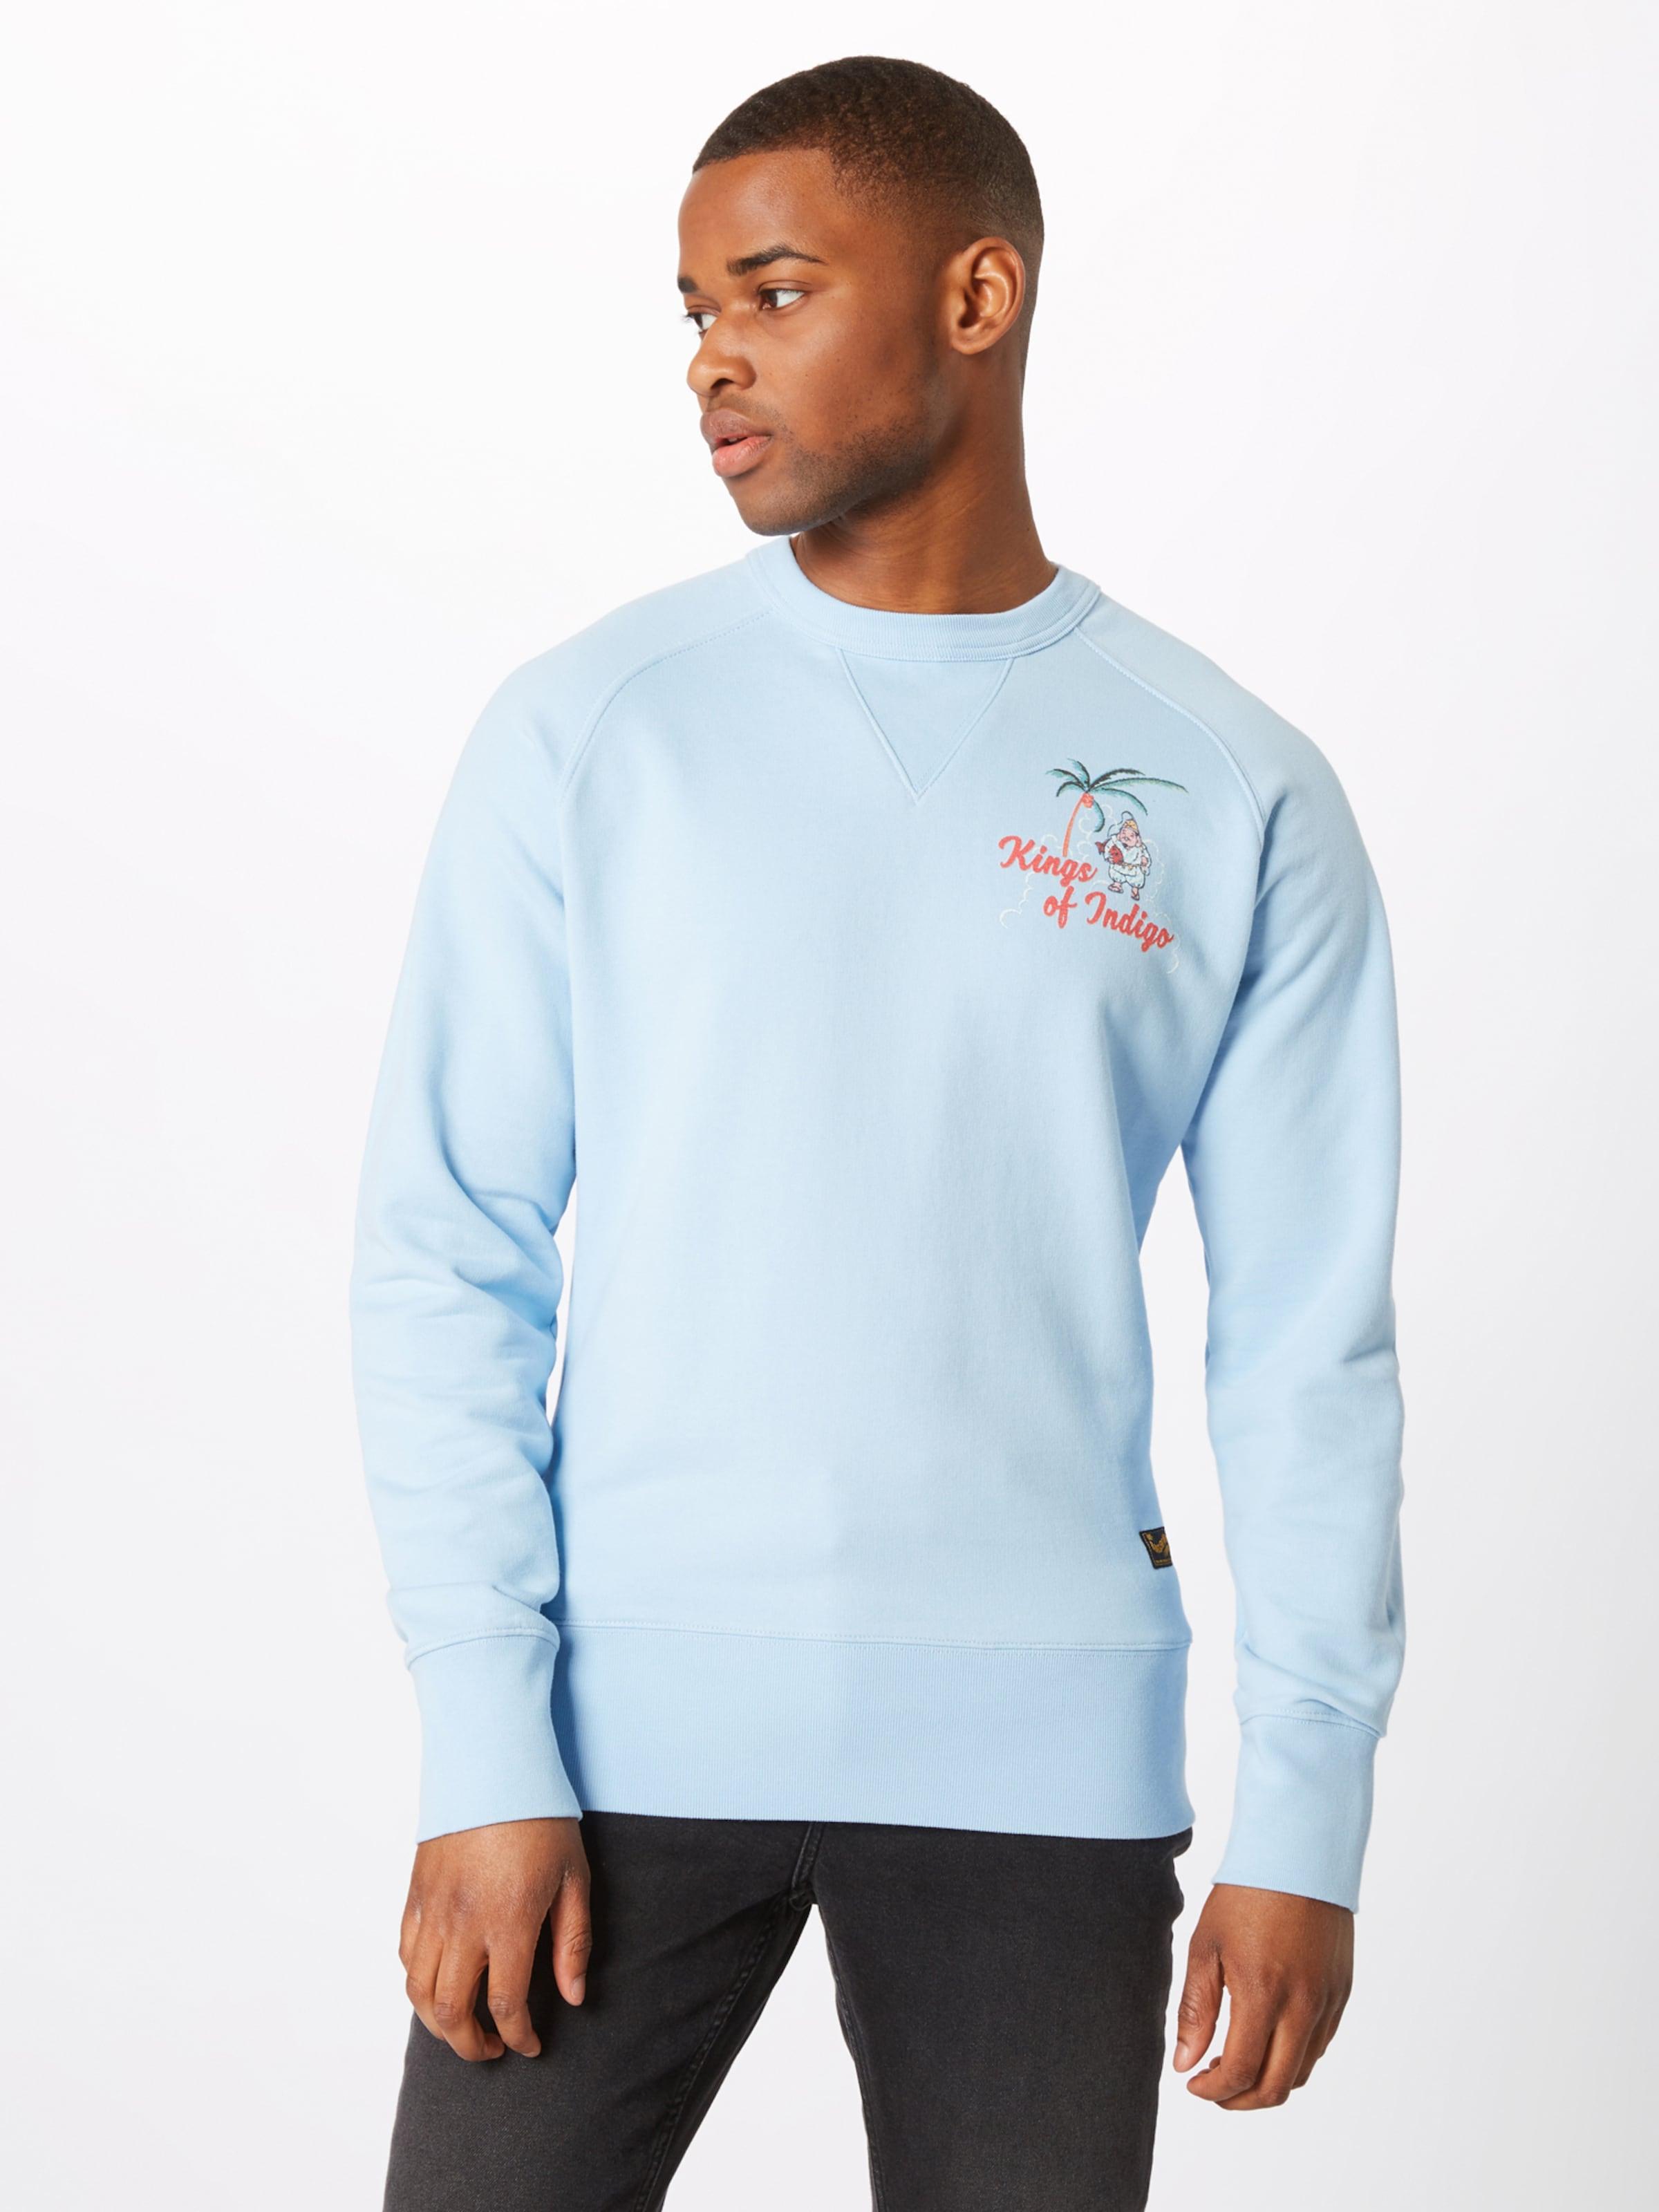 Bleu Clair Indigo En 'parnell' Kings shirt Of Sweat tdBhrCsQx